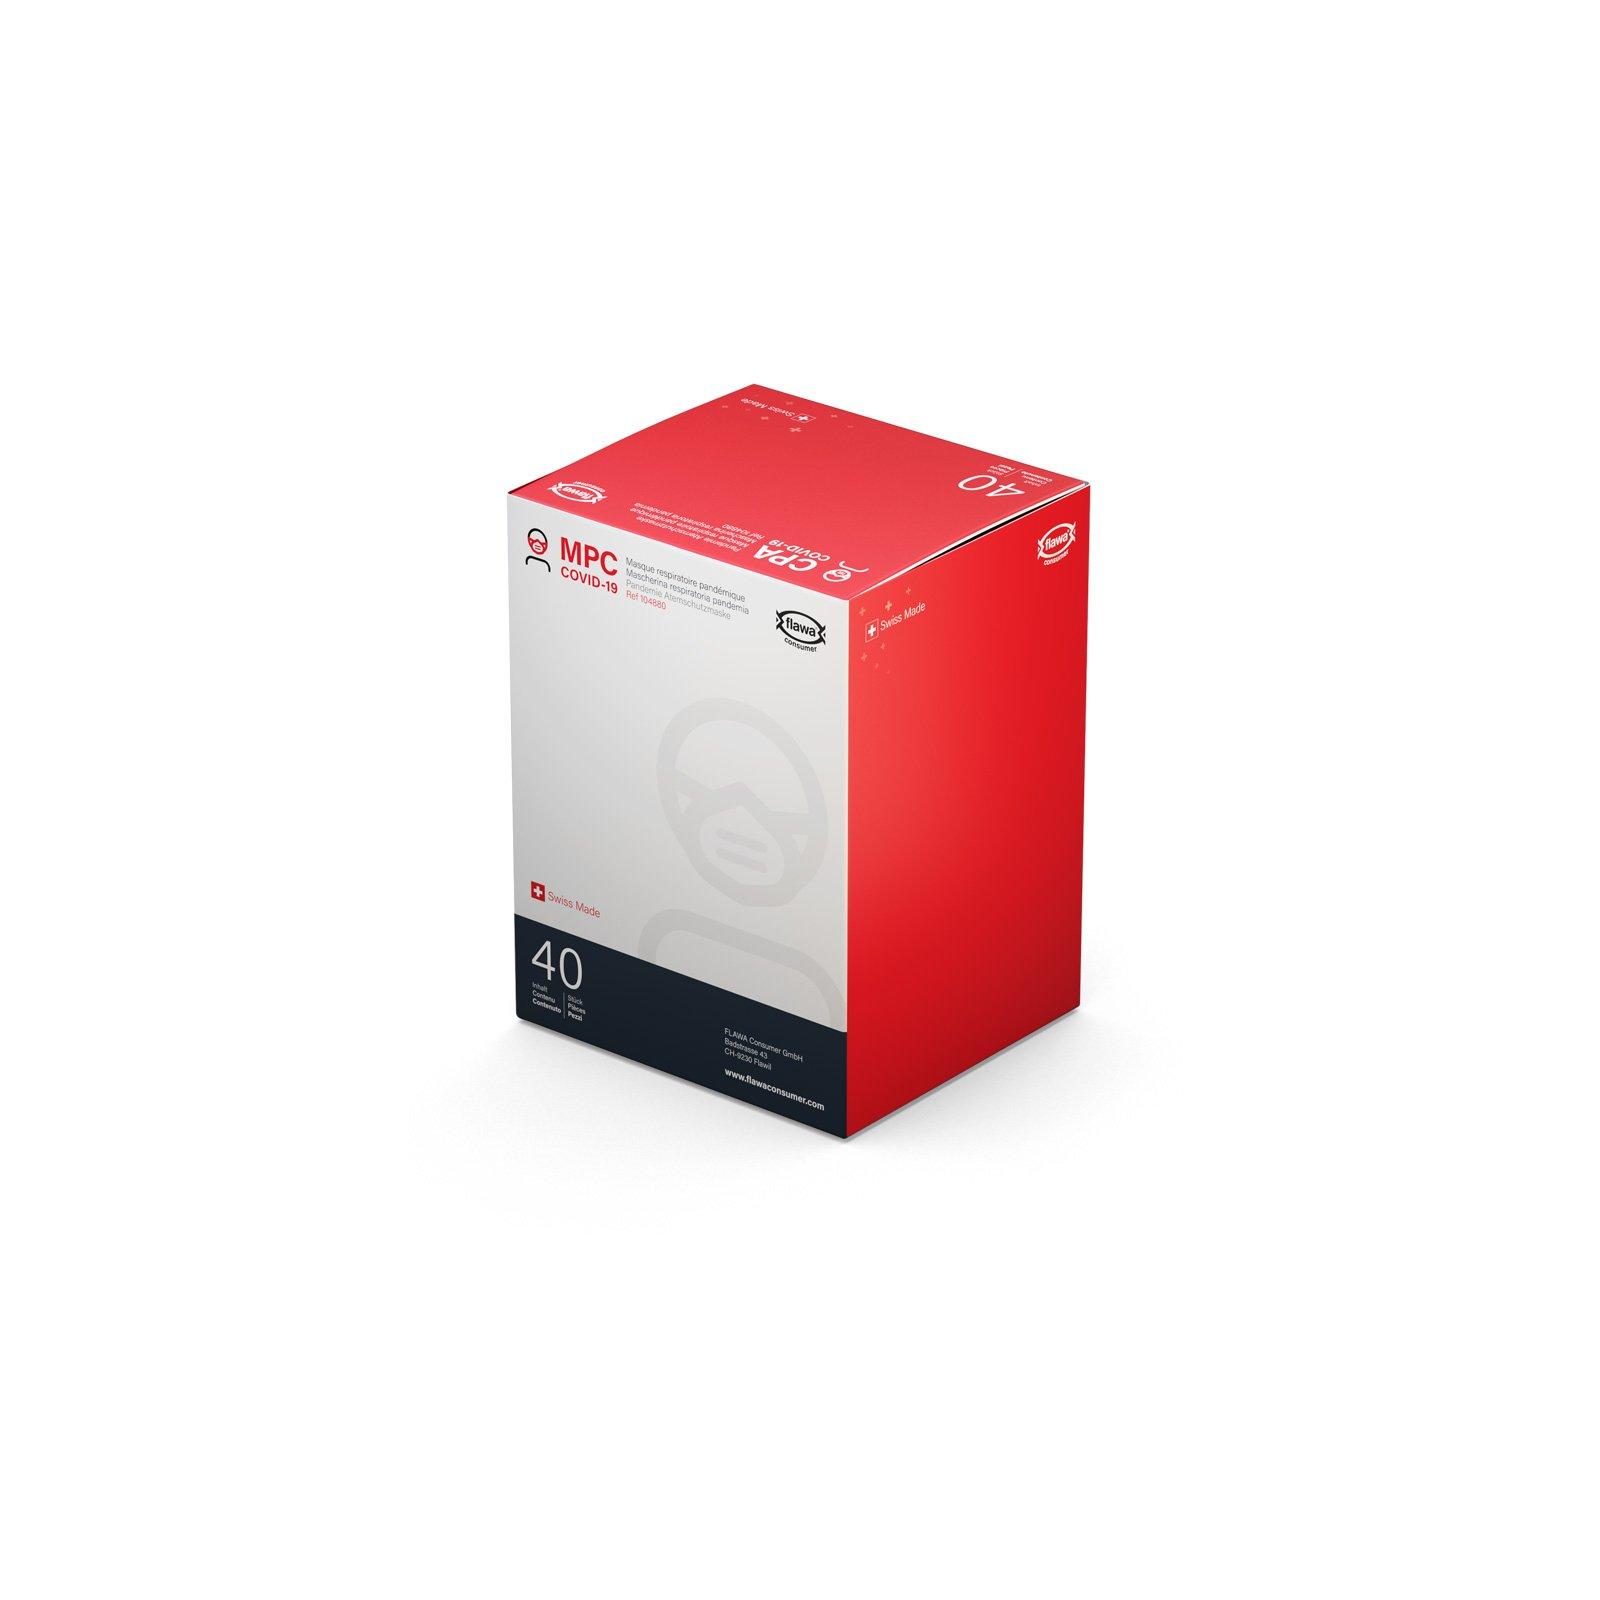 CPA/COVID-19 Pandemie Atemschutzmaske Karton à 40 Stk.